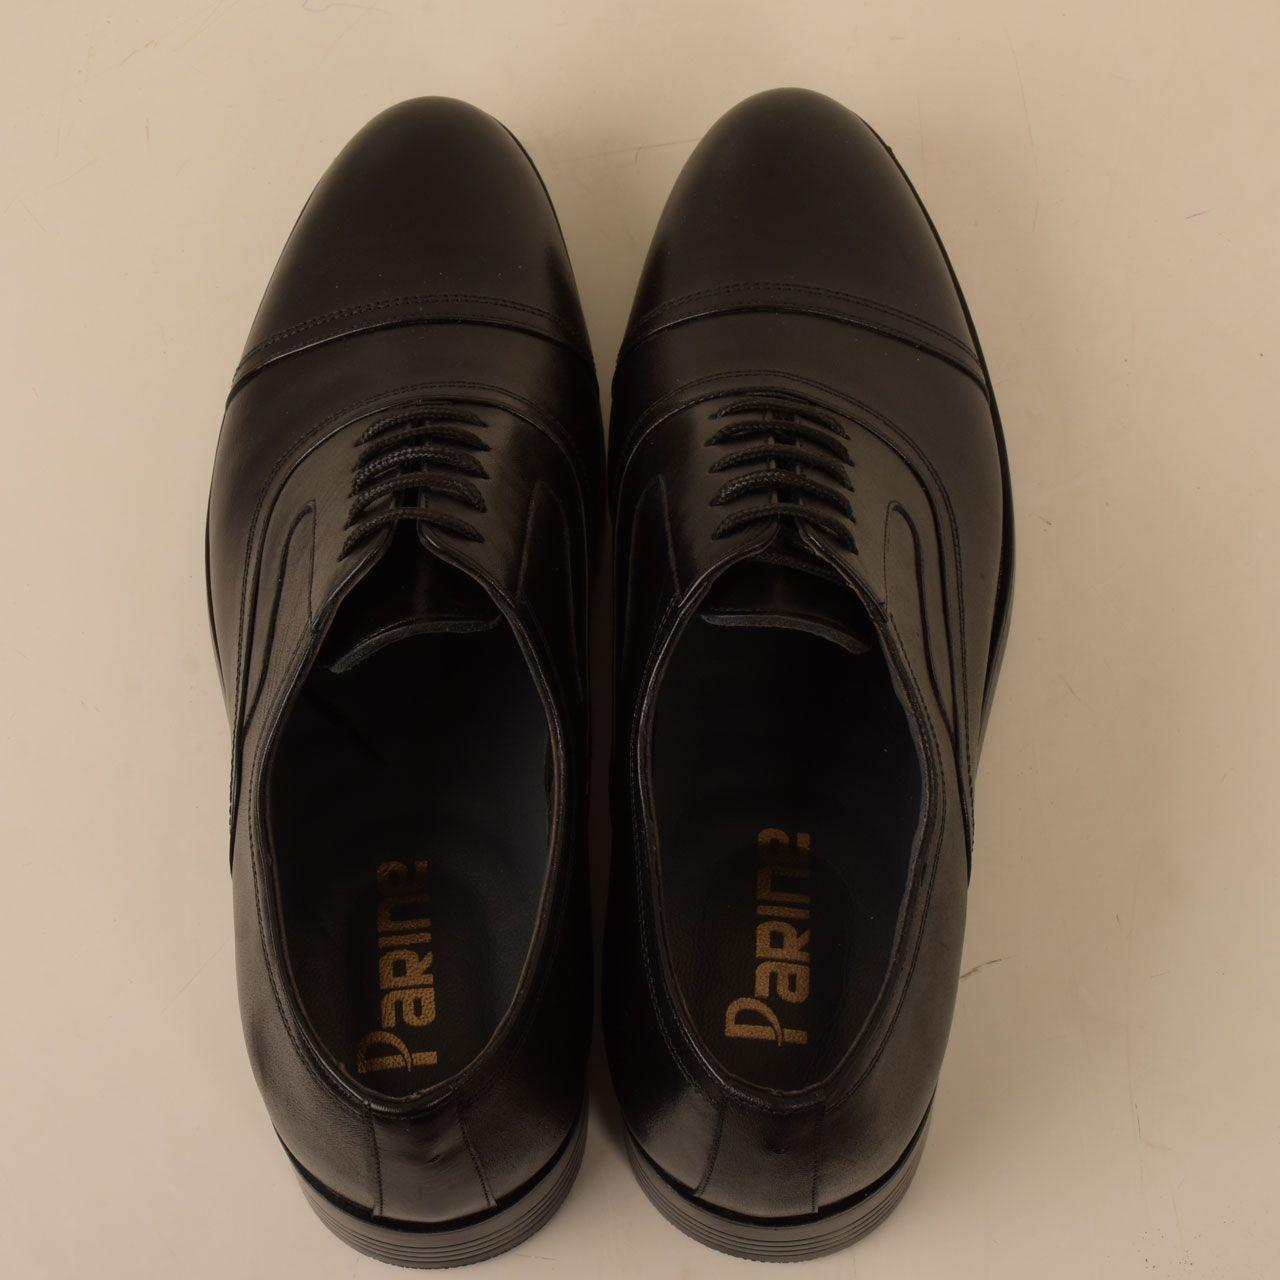 کفش مردانه پارینه چرم مدل SHO178 -  - 8